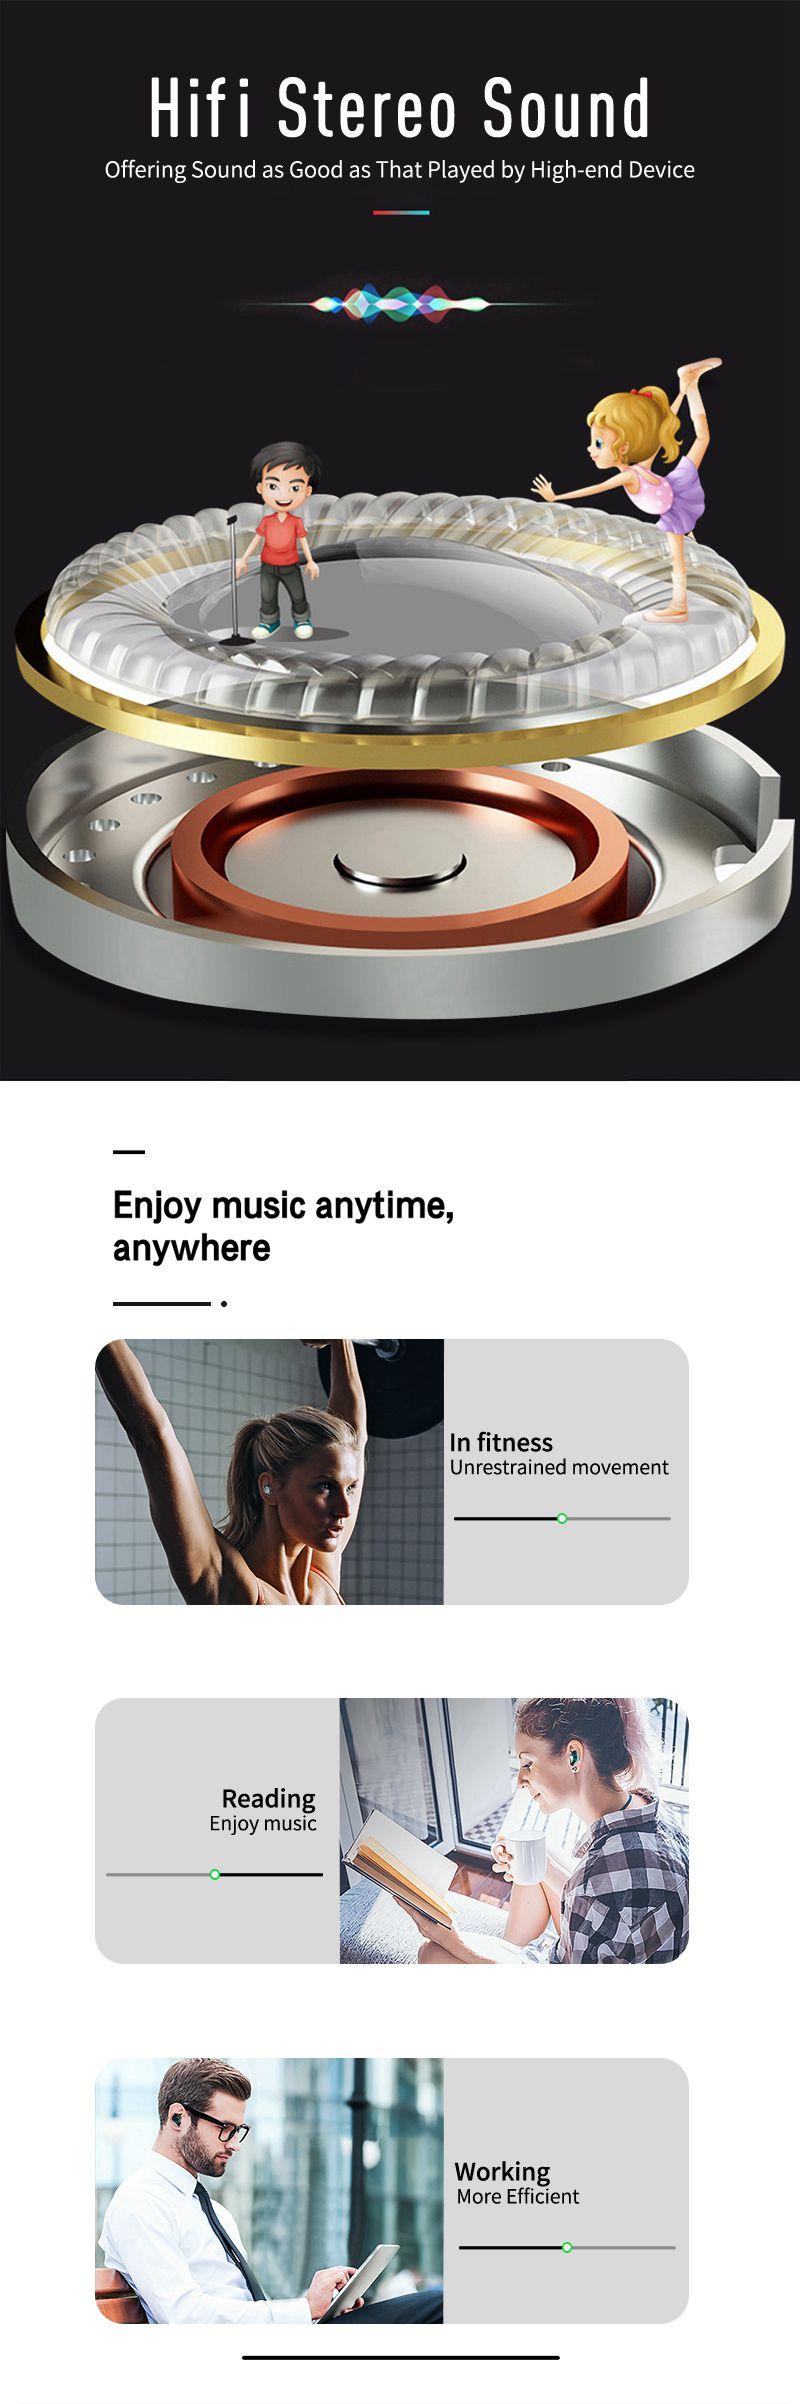 TWS 8000mAh Earphones Bluetooth 9D Stereo Wireless Headphones IPX7 Waterproof Sport Earbuds Headsets With LED Display Earphone (9)